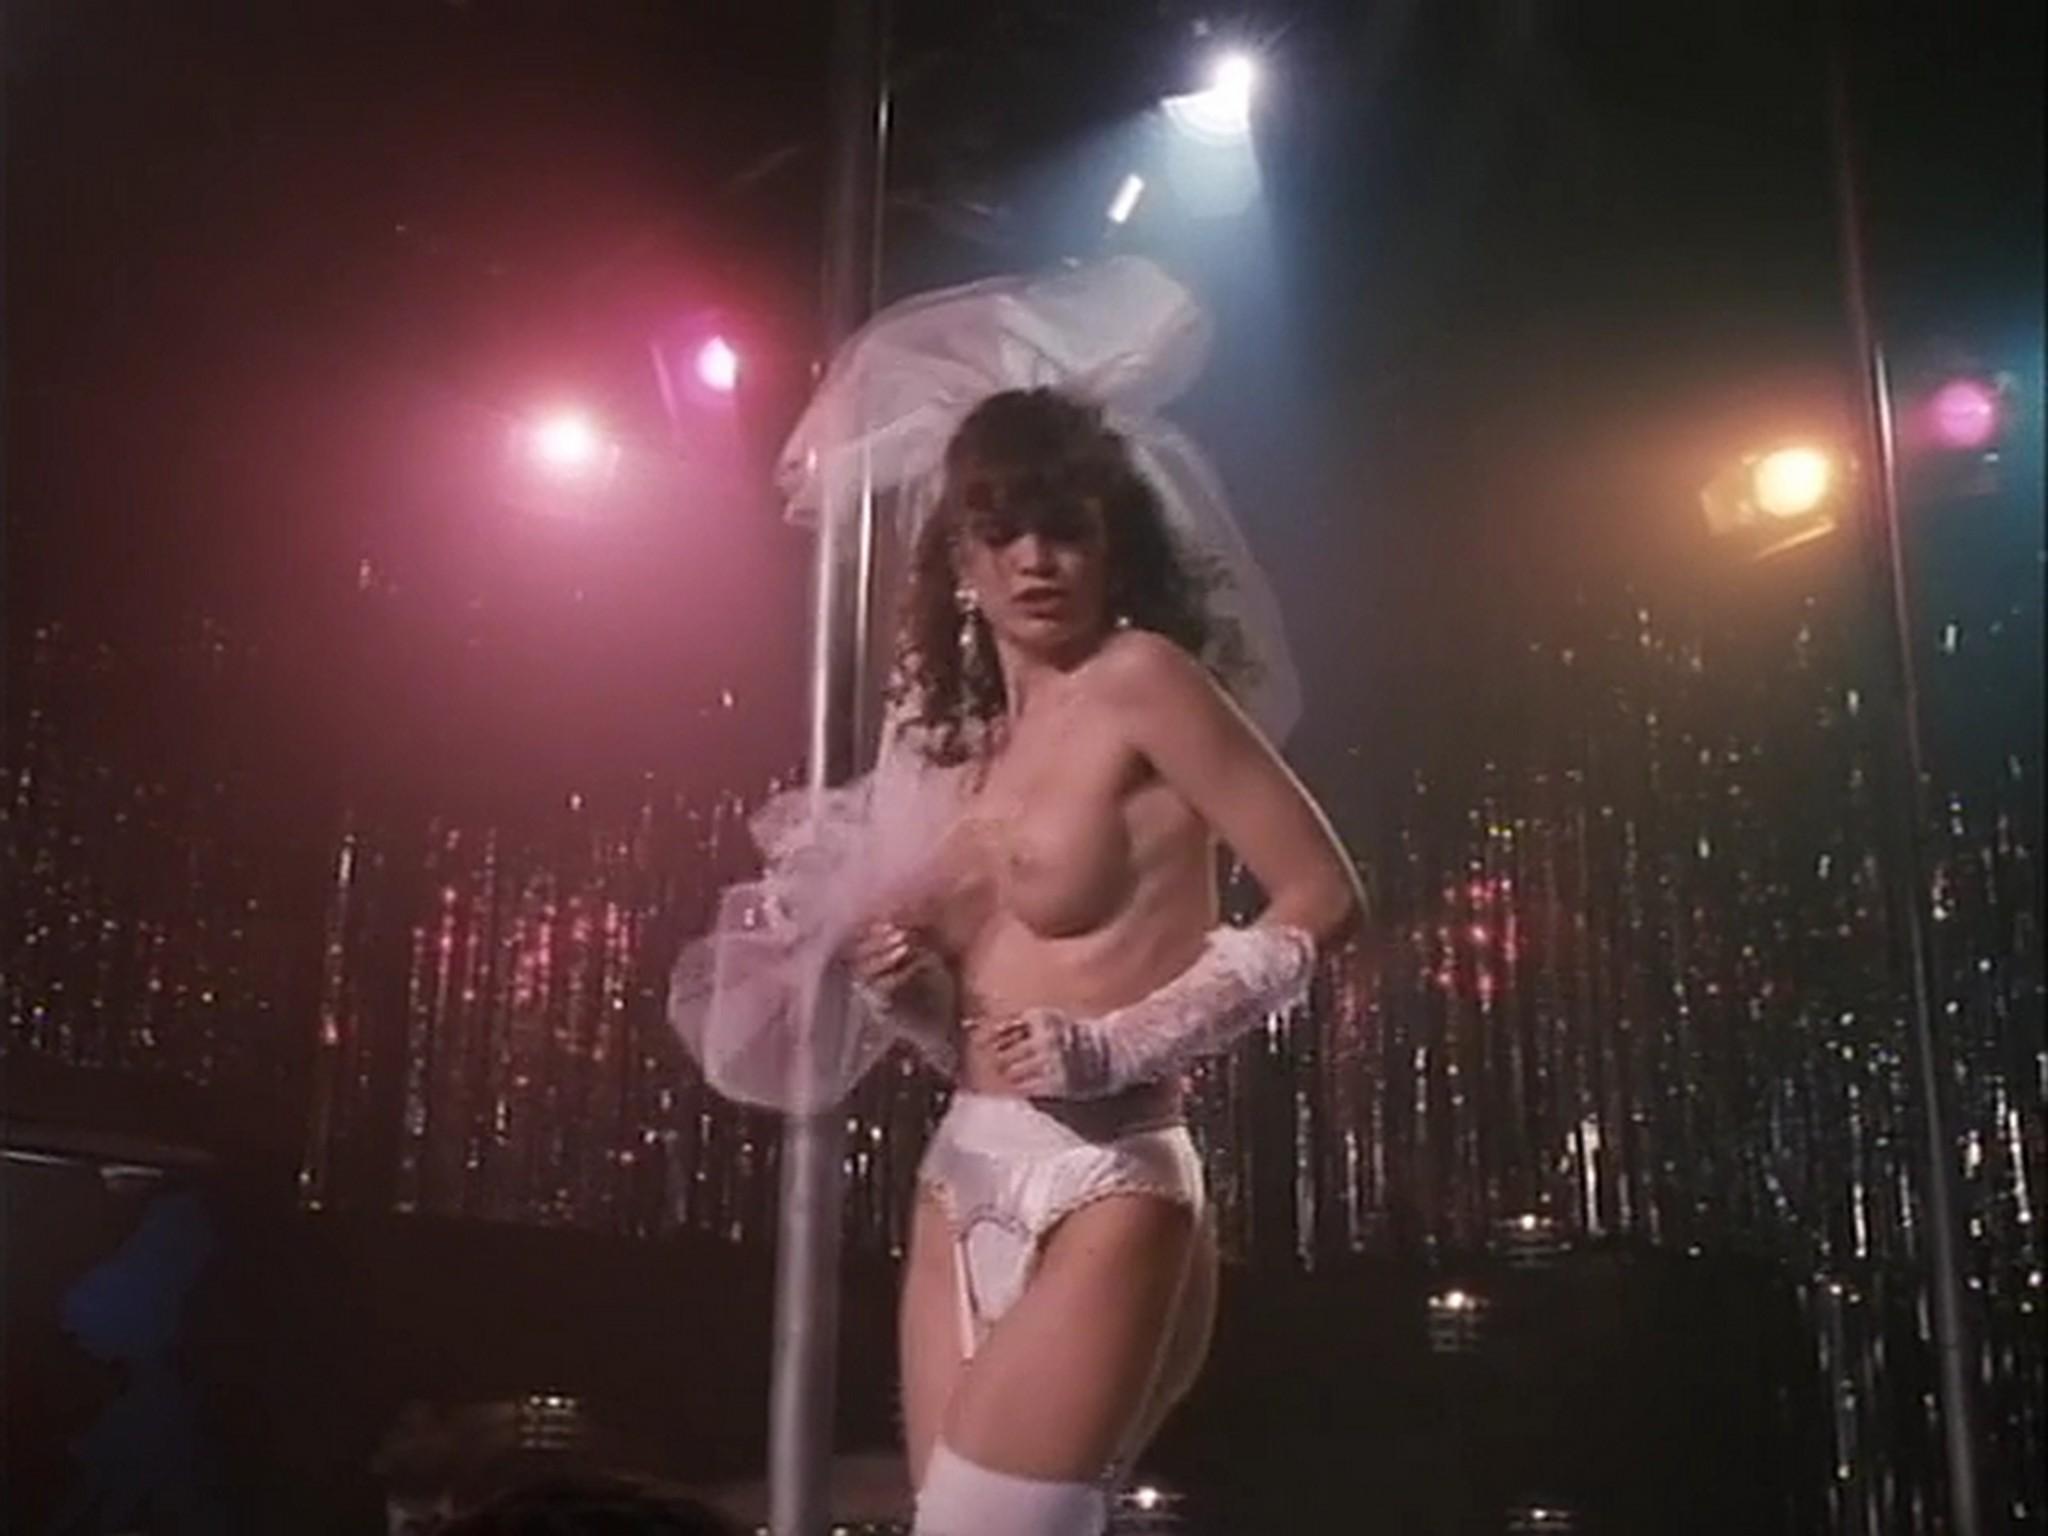 Barbara Alyn Woods nude Catya Sassoon Jill Pierce nude too as strippers Dance with Death 1991 4